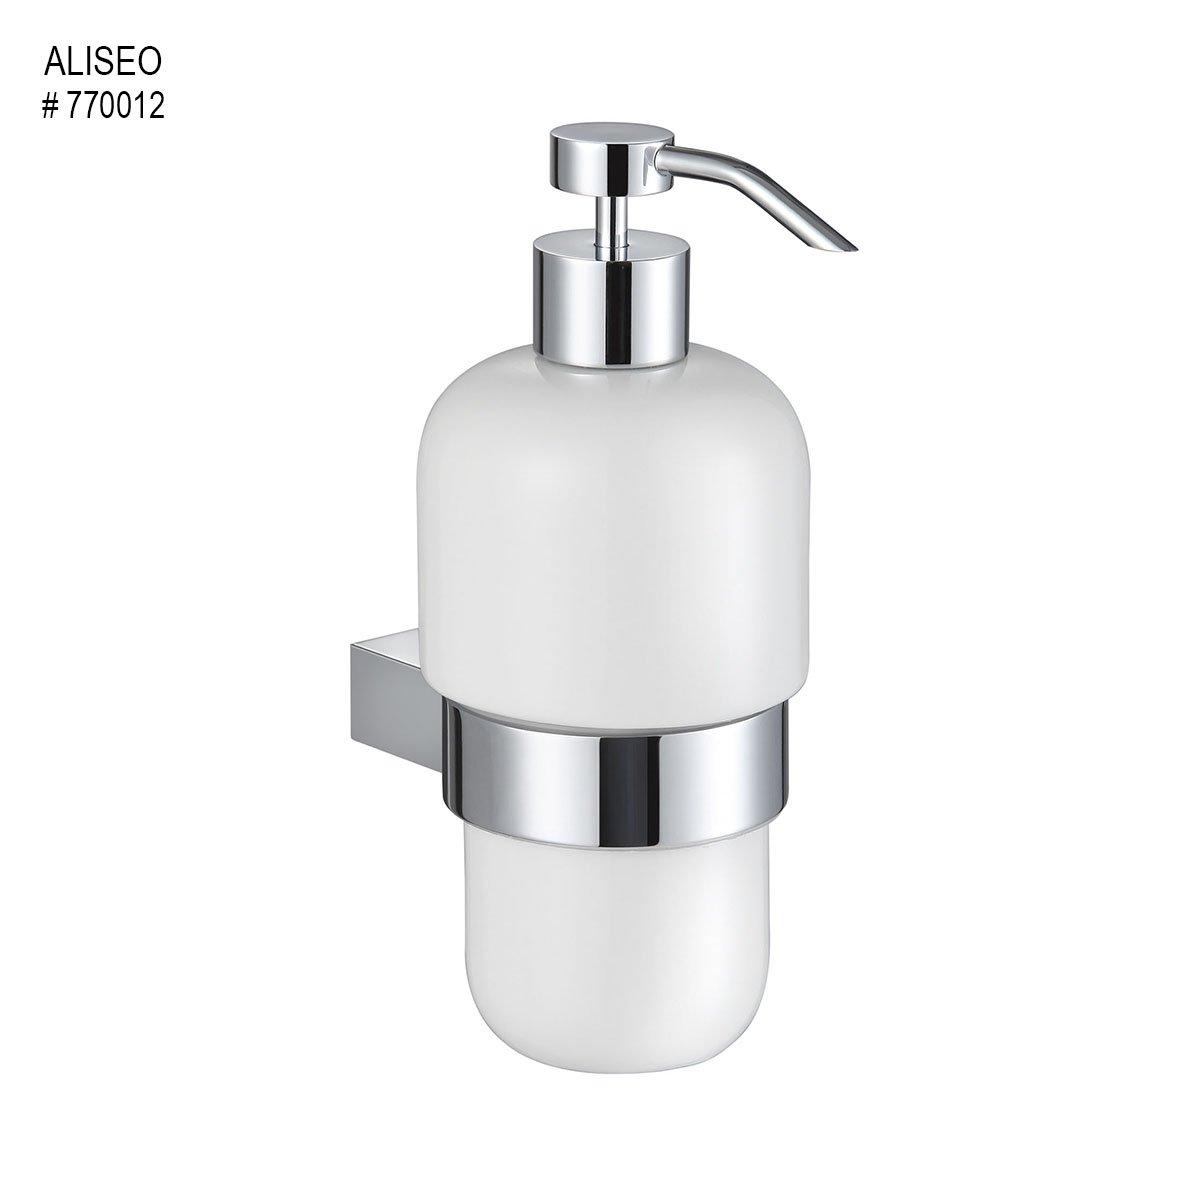 14_Soap Dish architecto